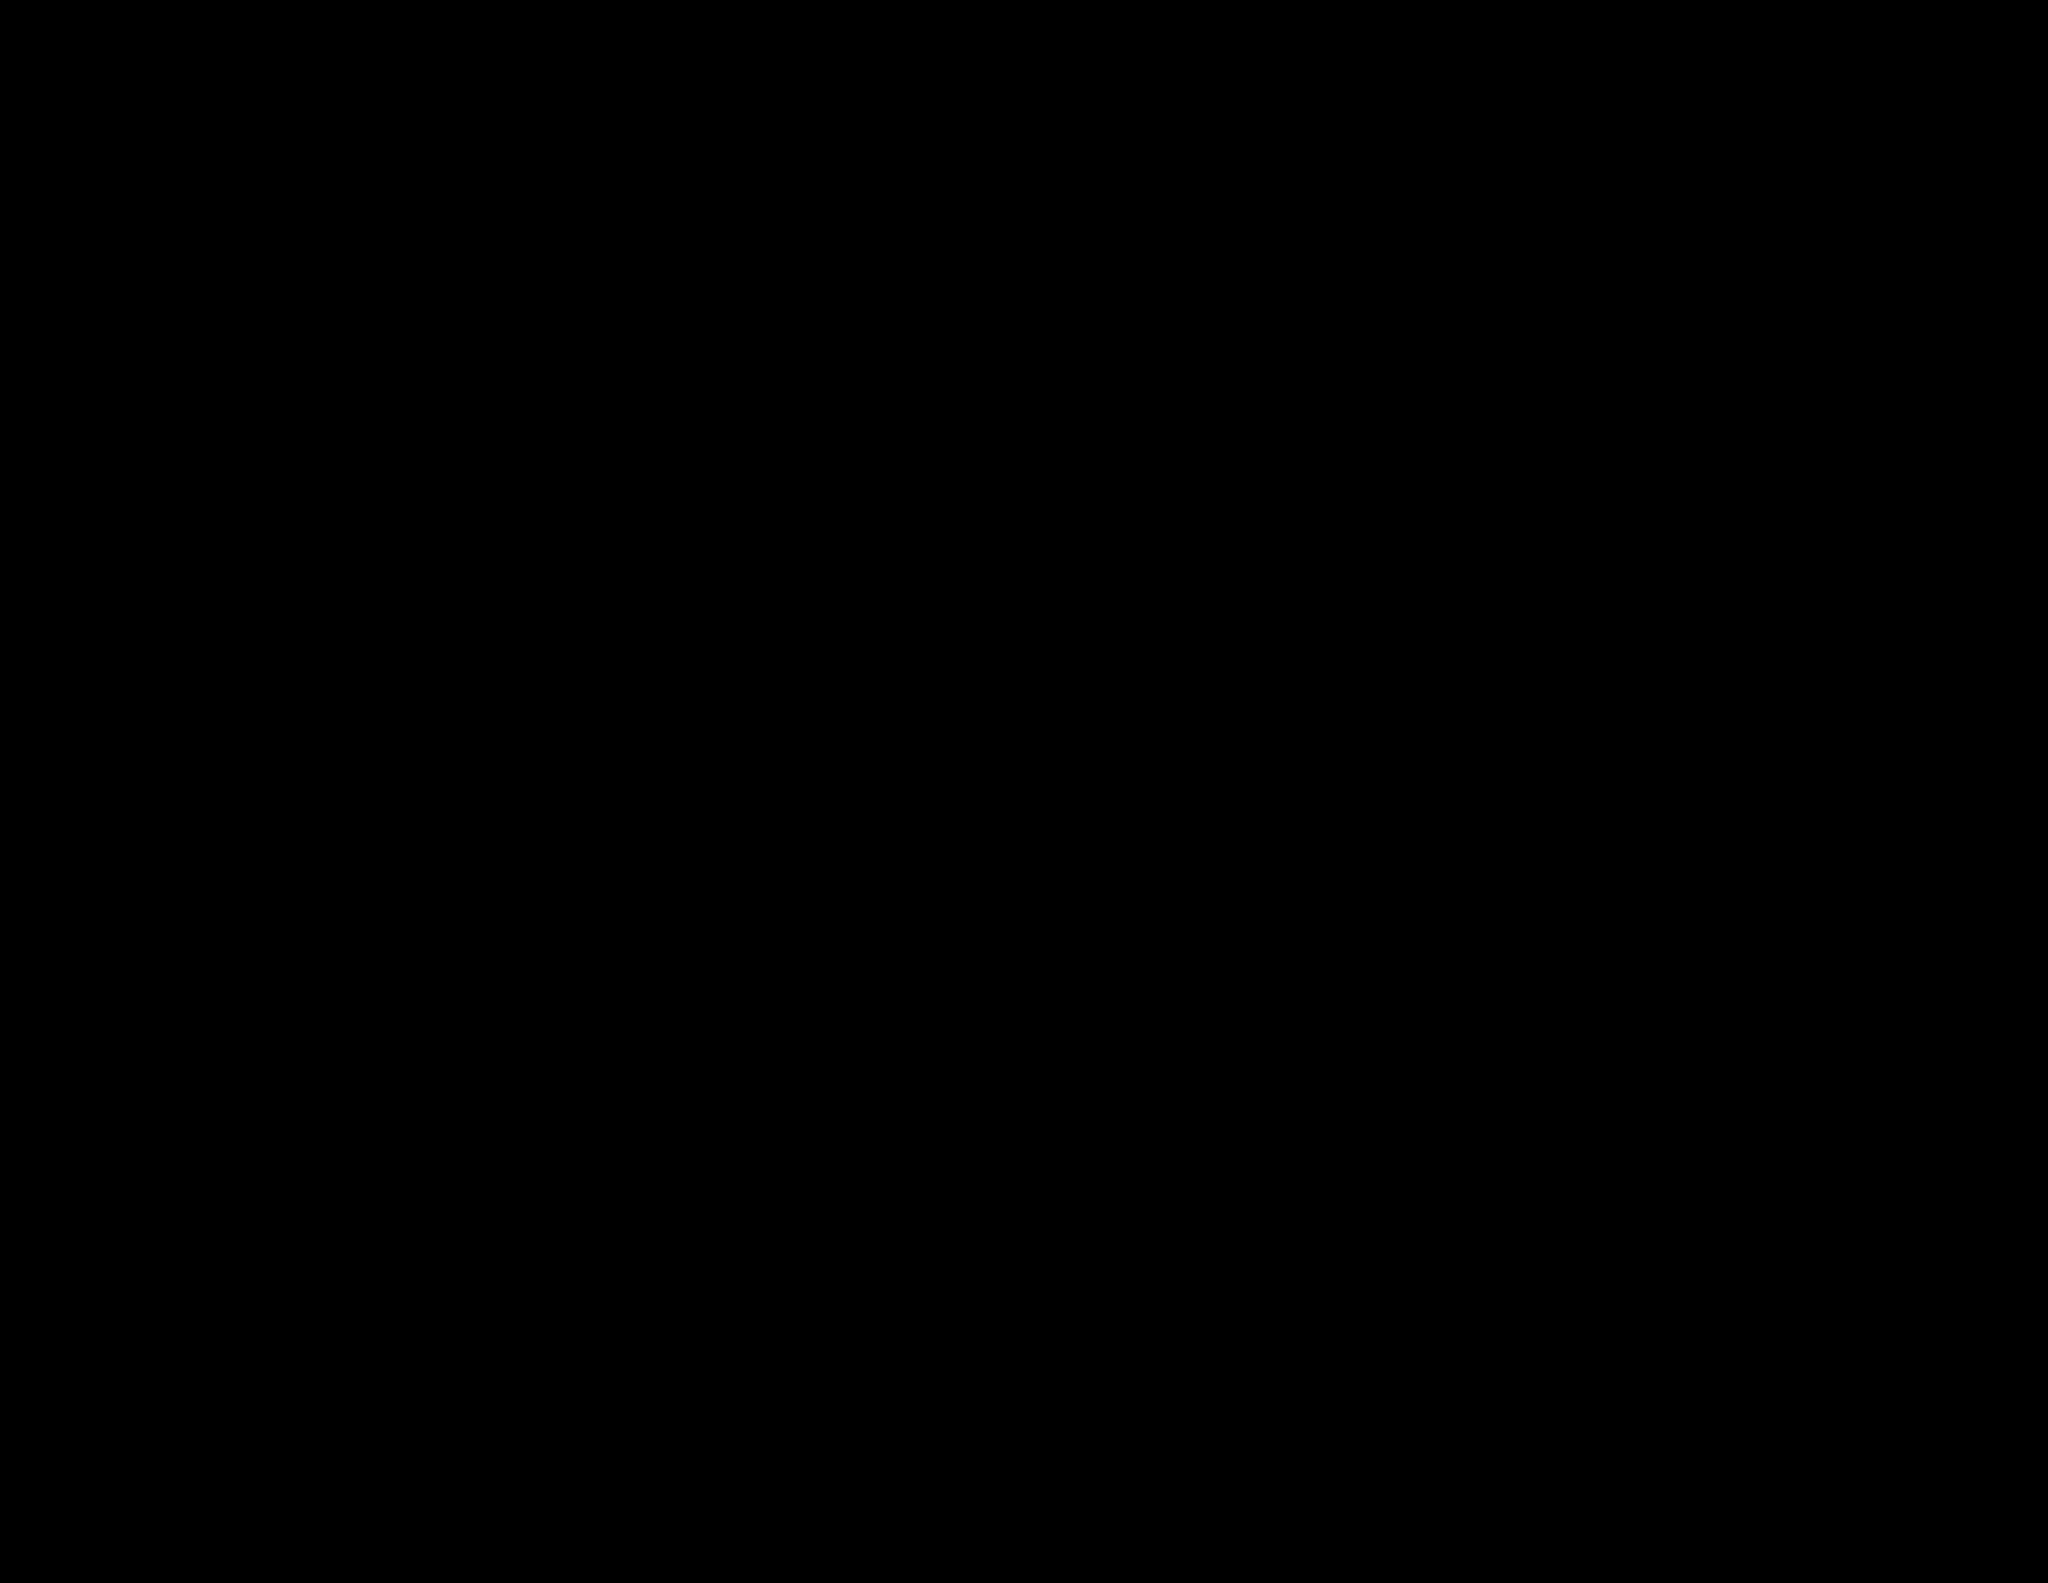 Black Cat Mask Pattern